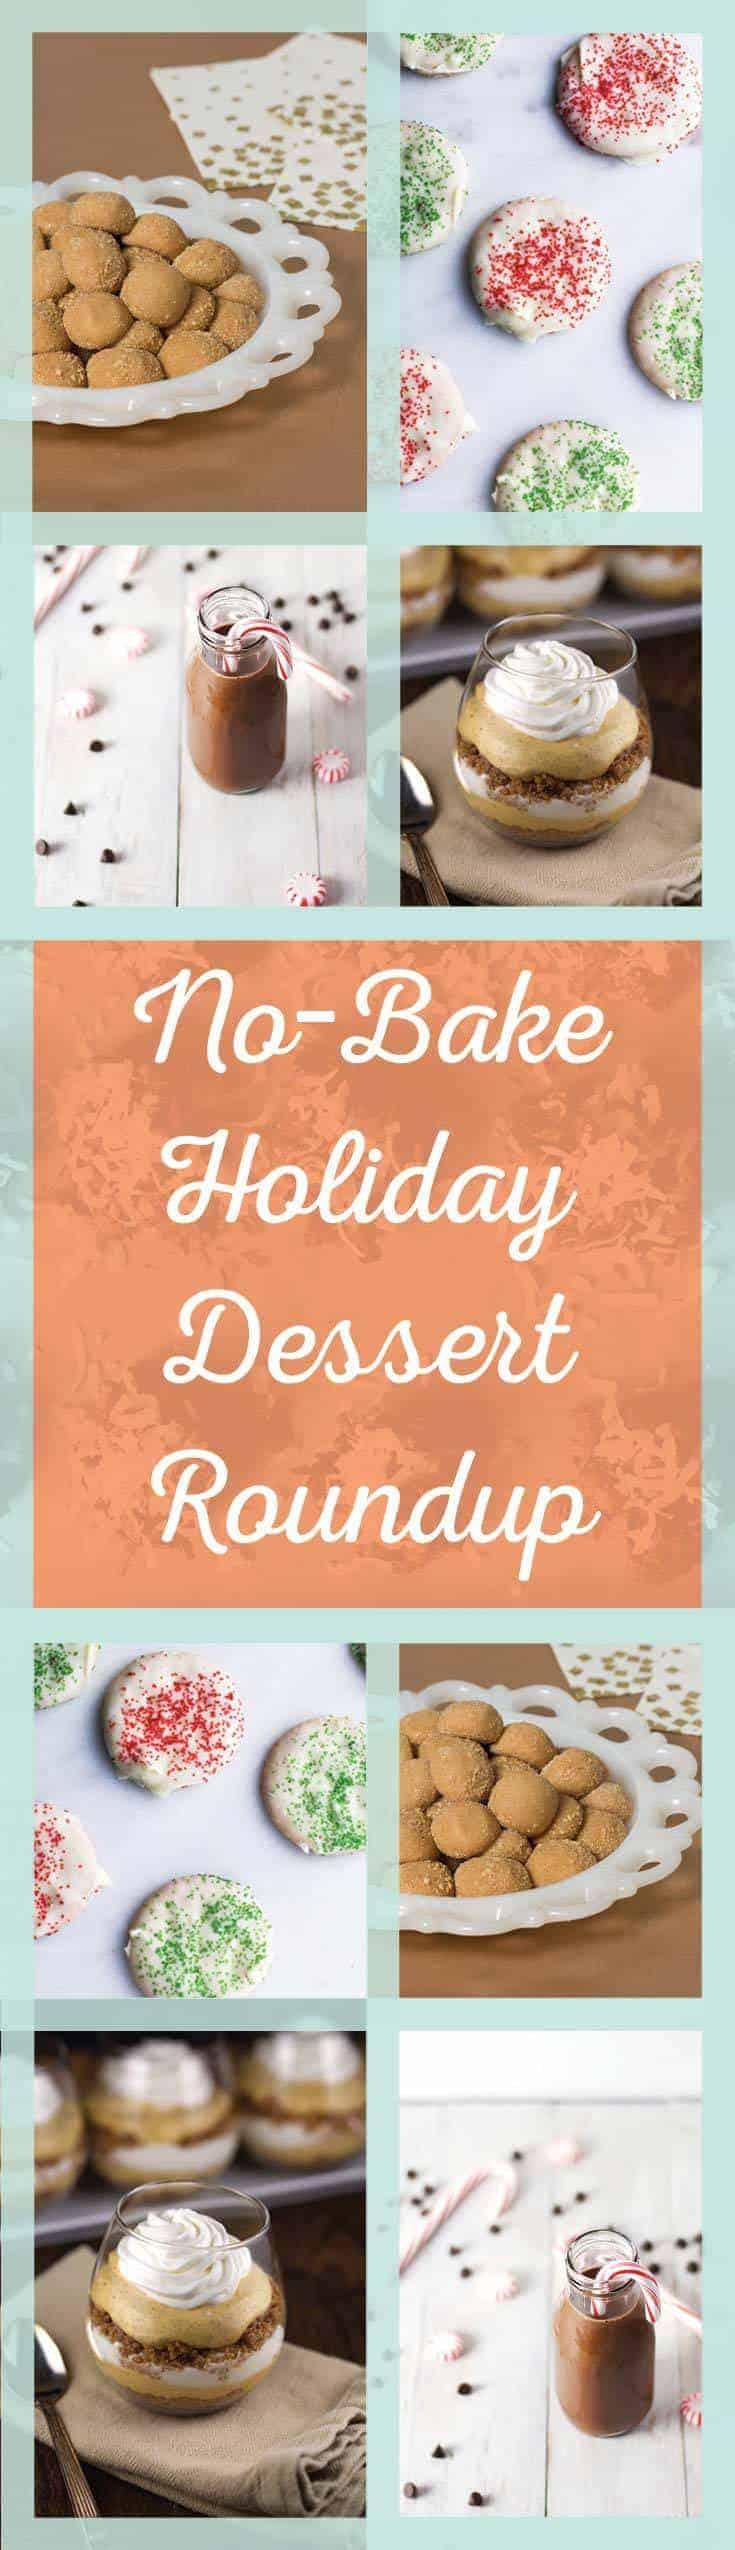 20 No Bake Holiday Desserts No Bake Desserts Cup Of Zest